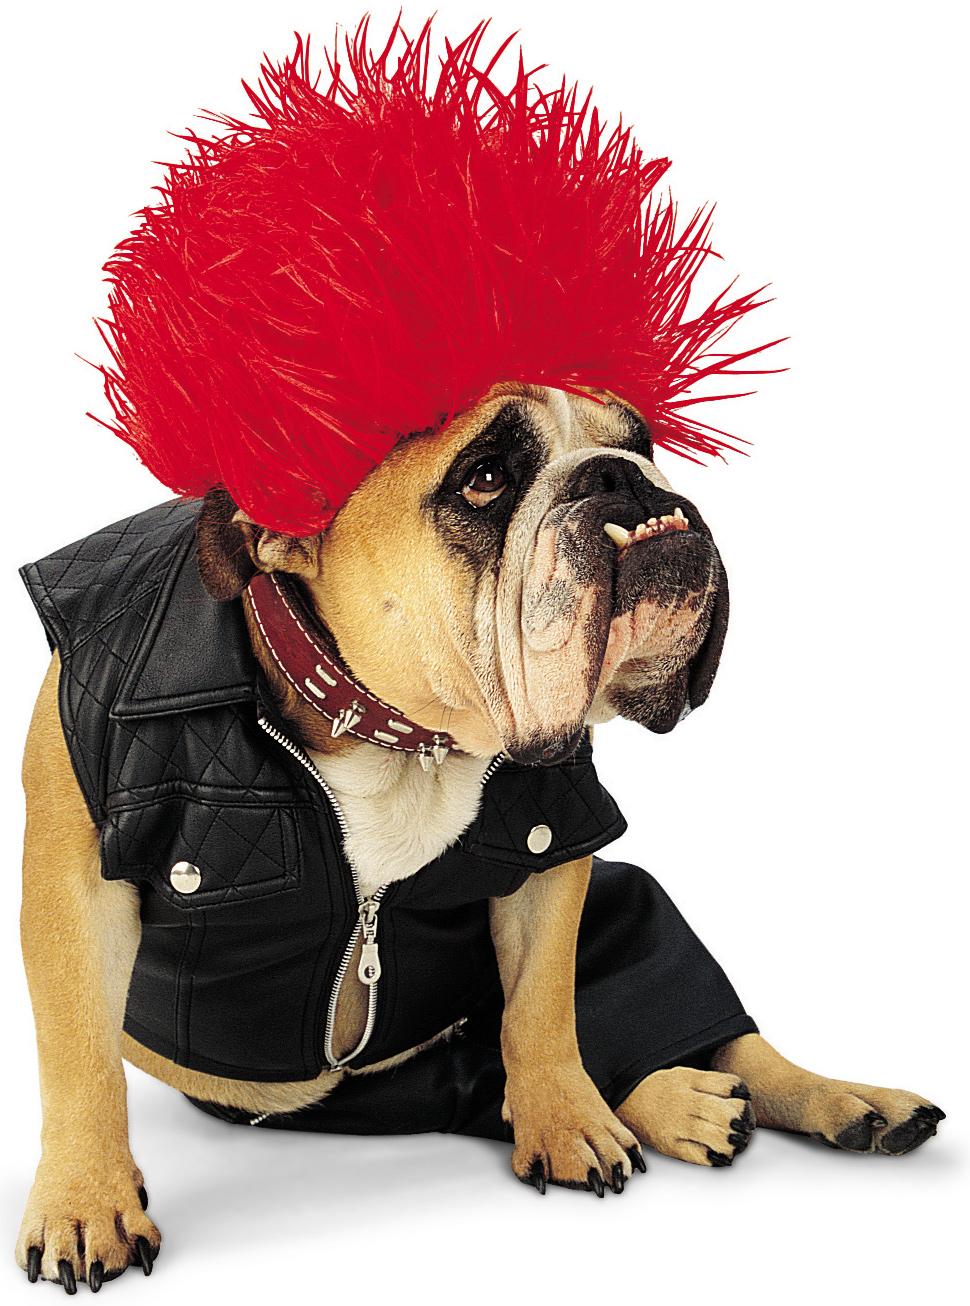 You Rock Dog